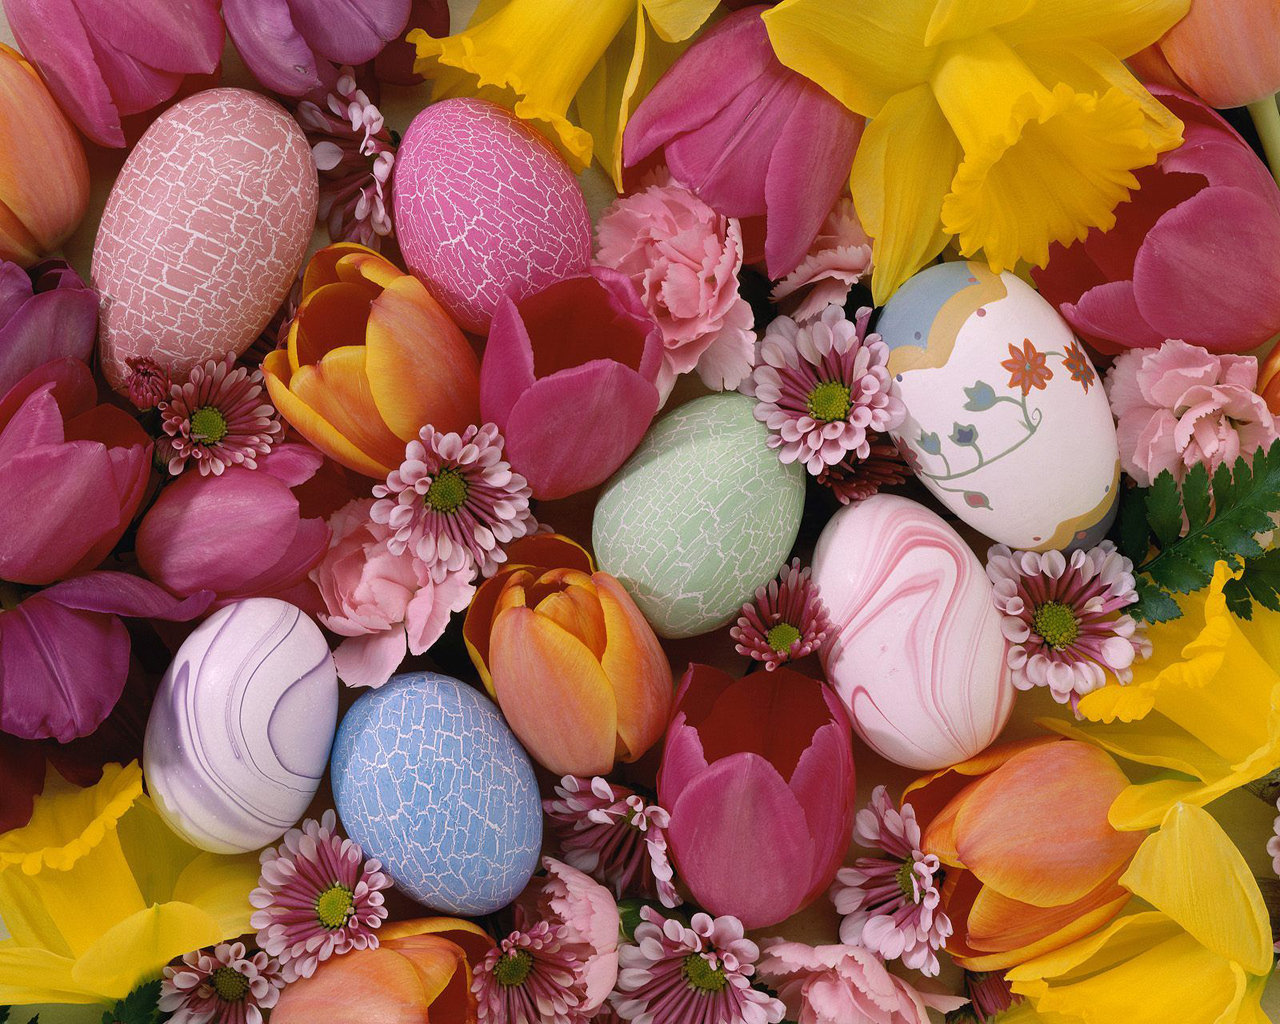 Free Download Wallpapers Of Flowers Wallpaper Flower